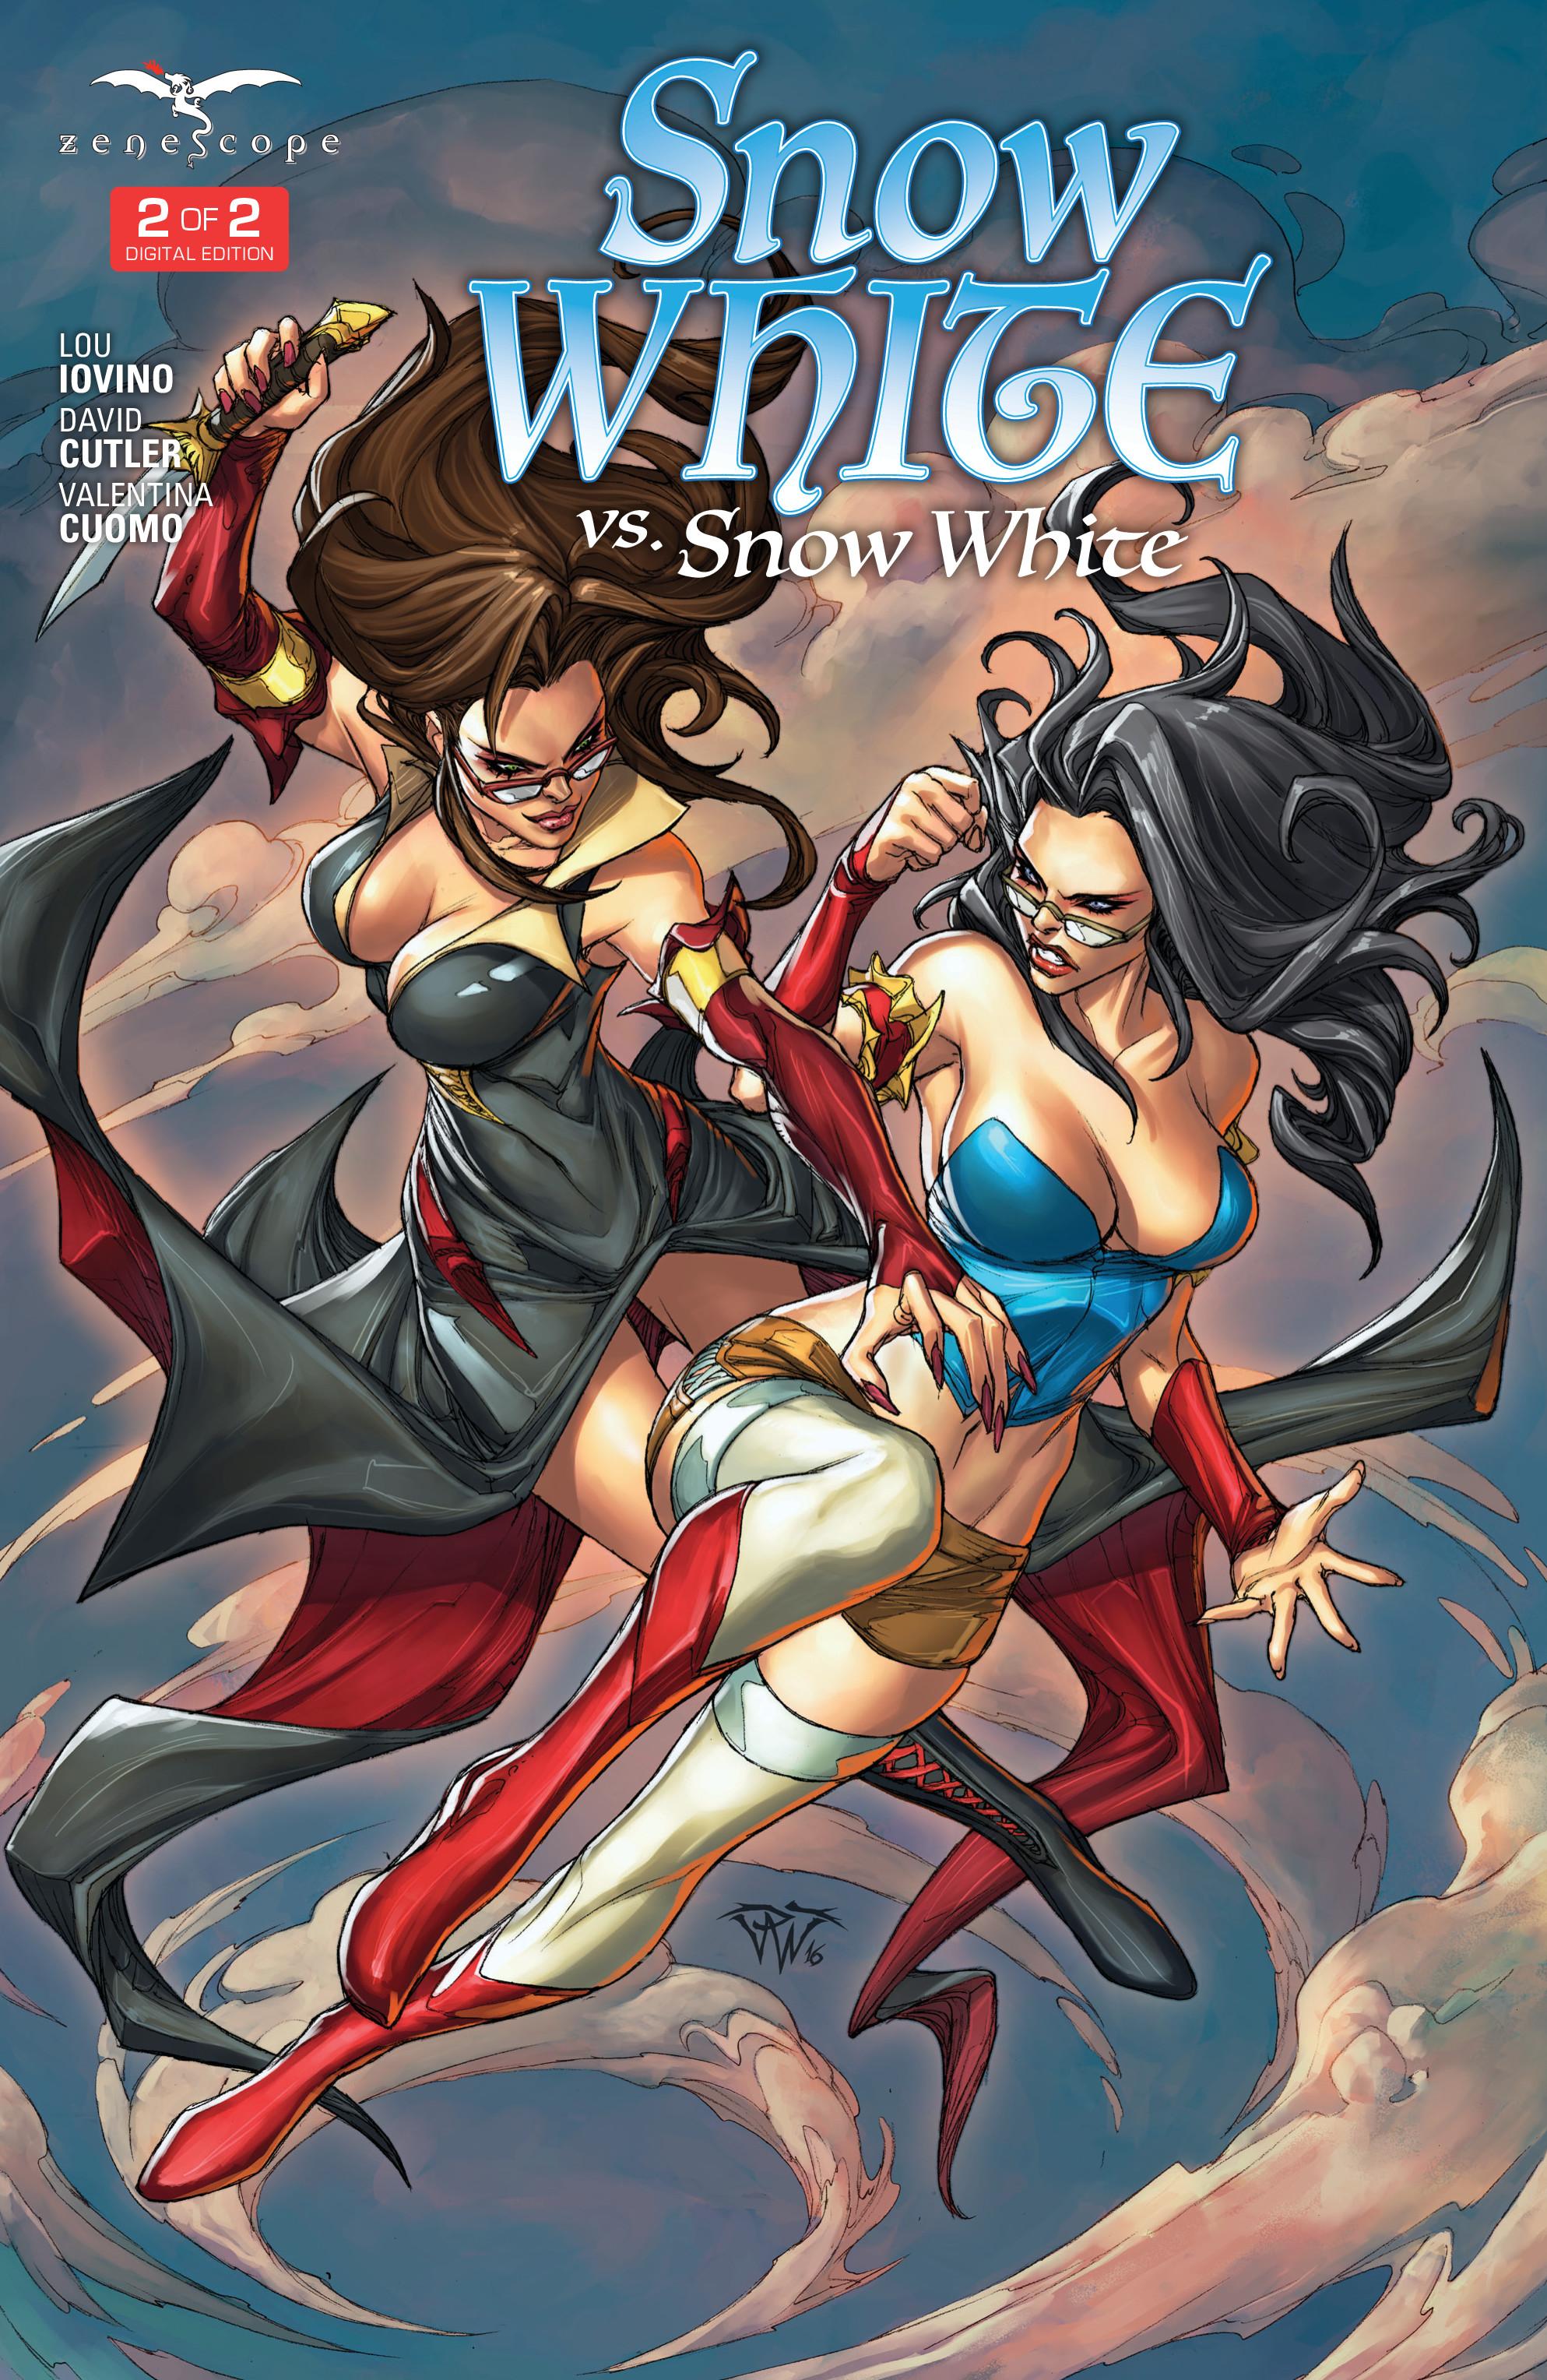 Read online Snow White vs. Snow White comic -  Issue #2 - 1